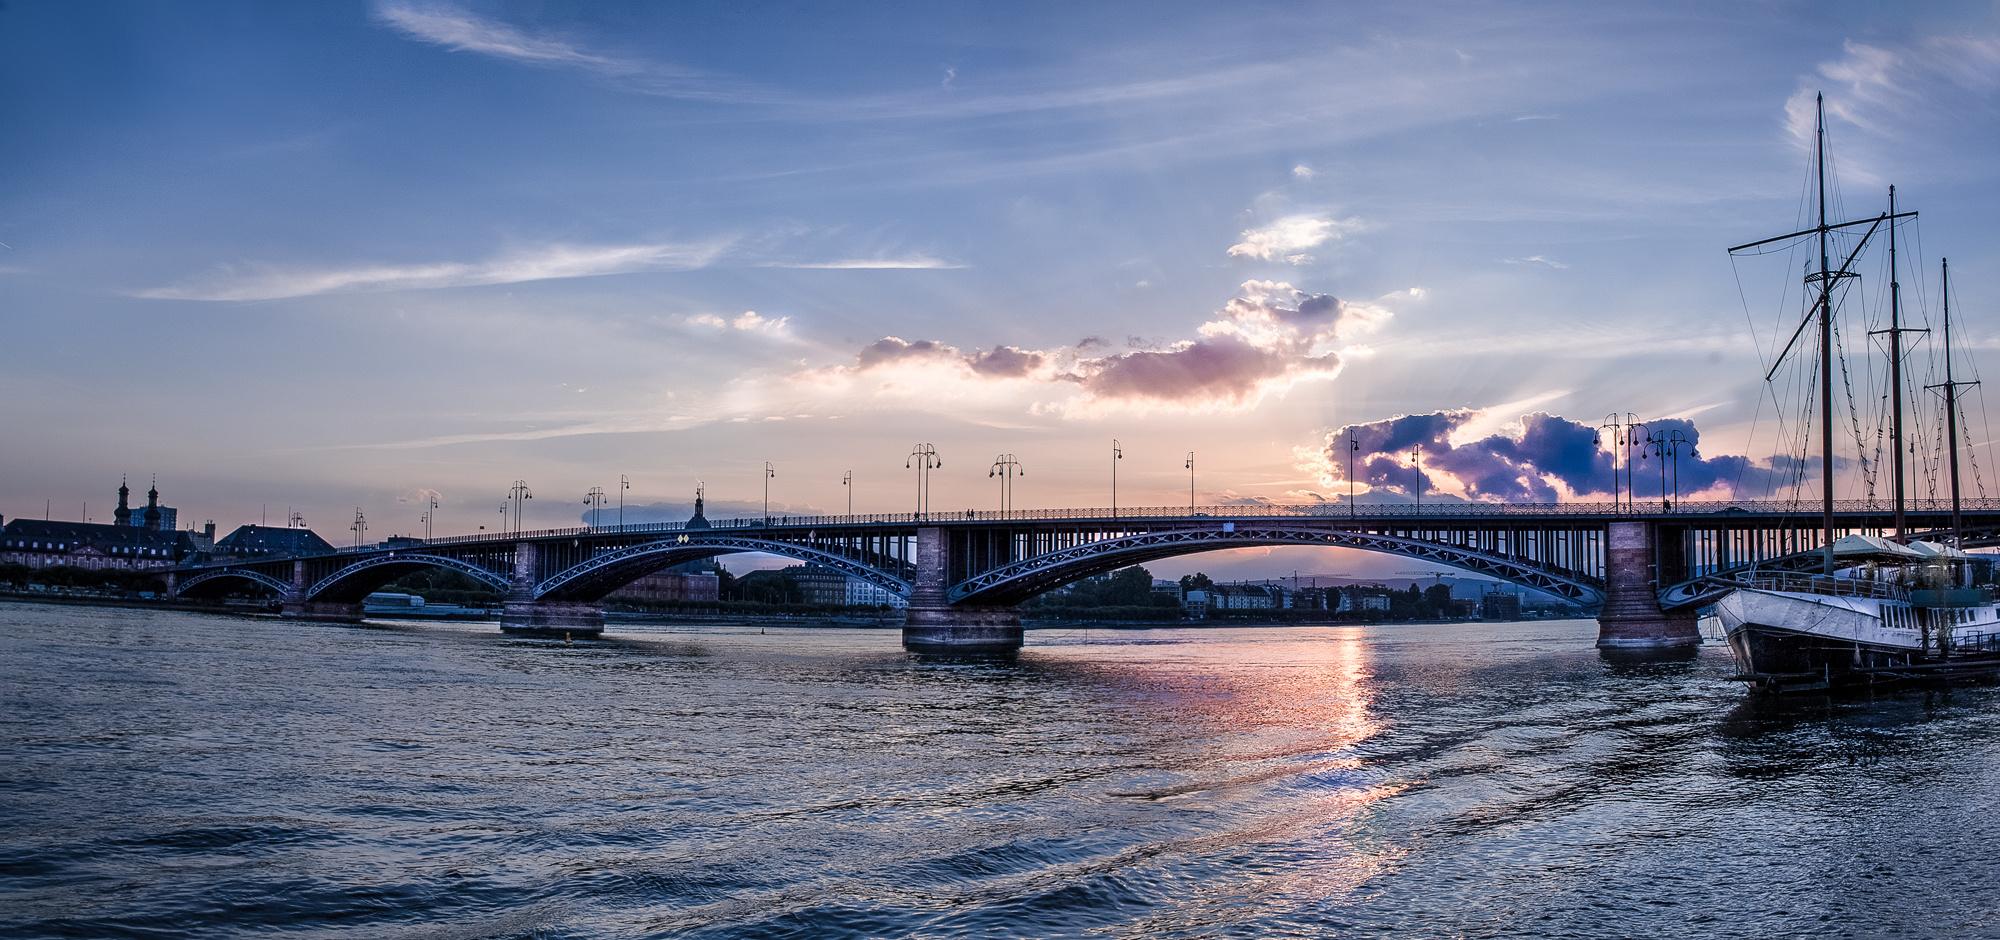 Mainz Theodor Heuss Brücke